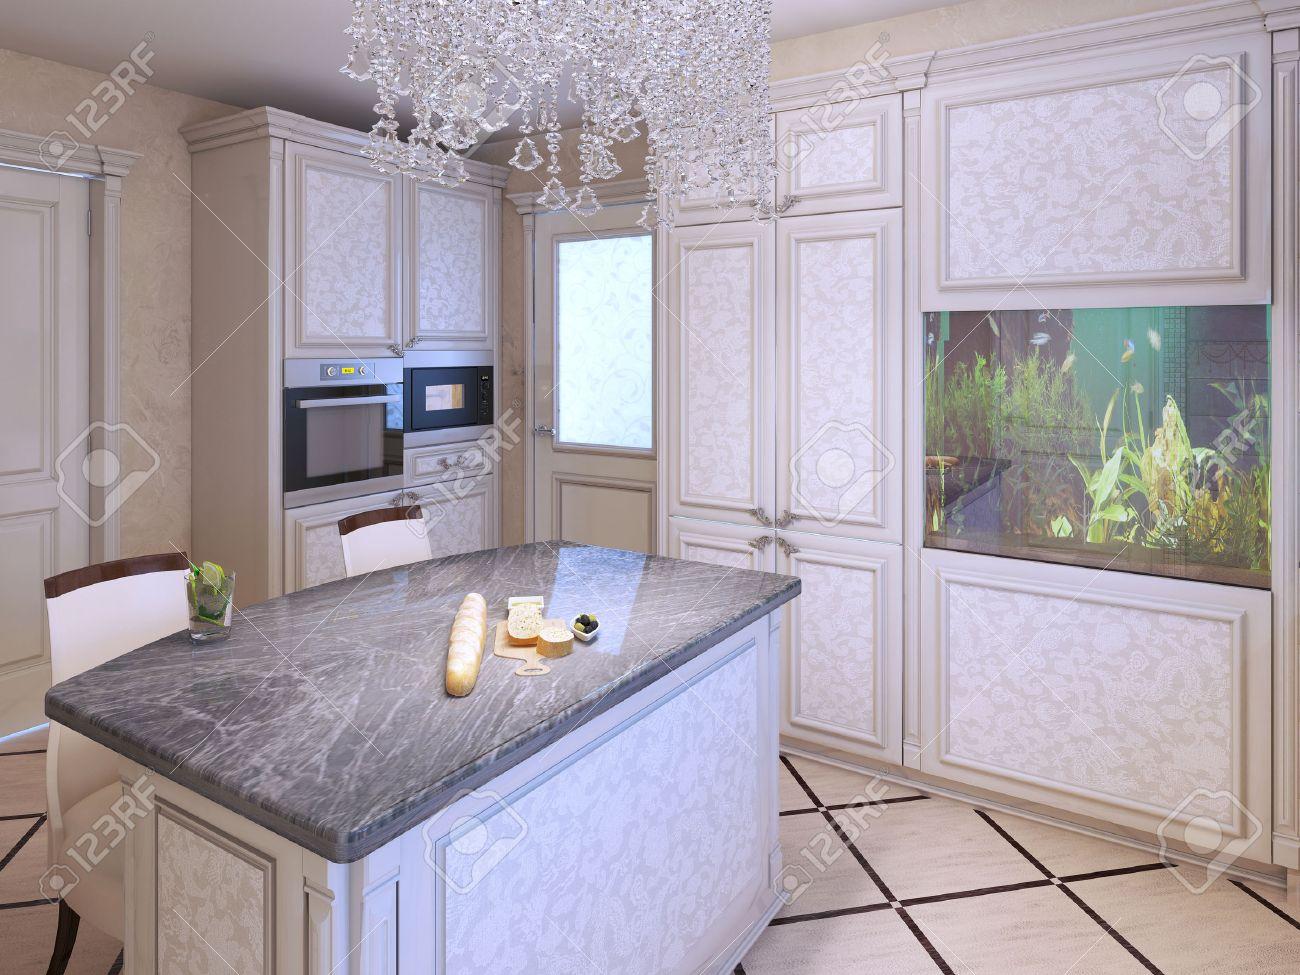 Bright Expensive Kitchen Design Island Bar With Granite Countertop Crystal Lamp And Aquarium